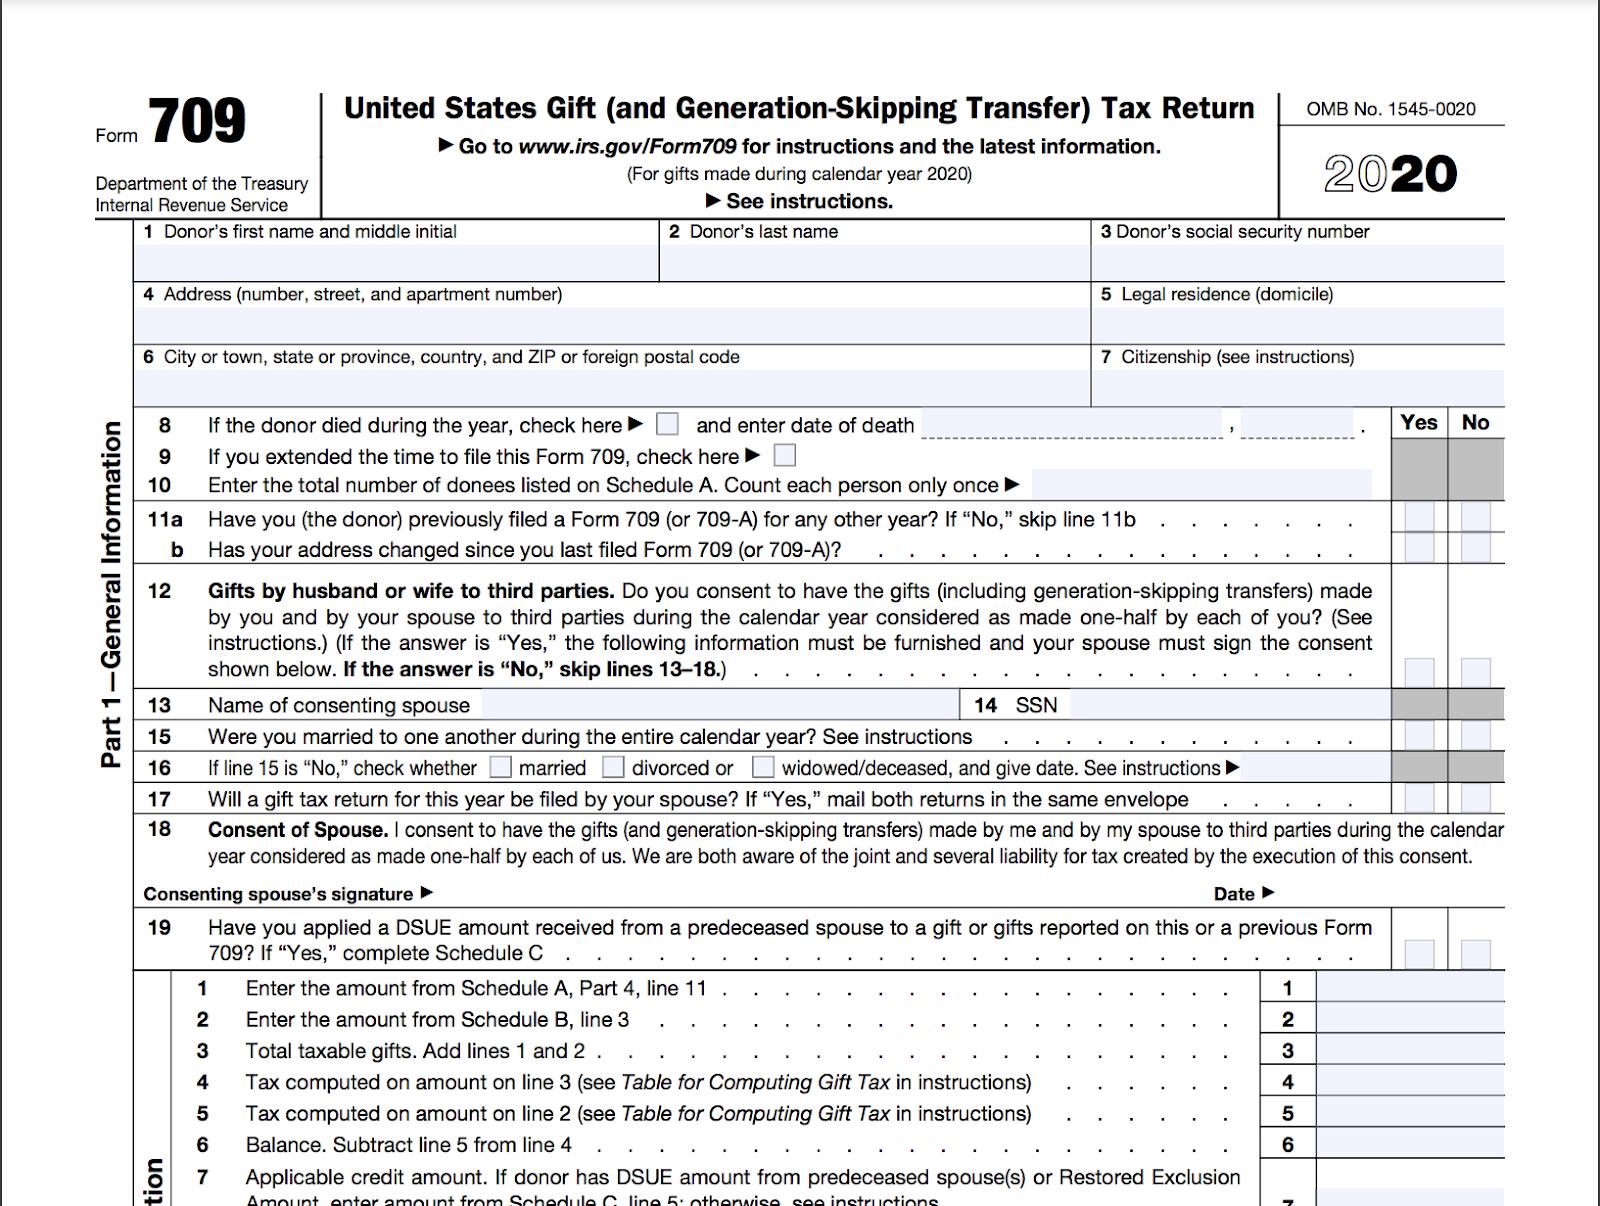 Screenshot of IRS Form 709.